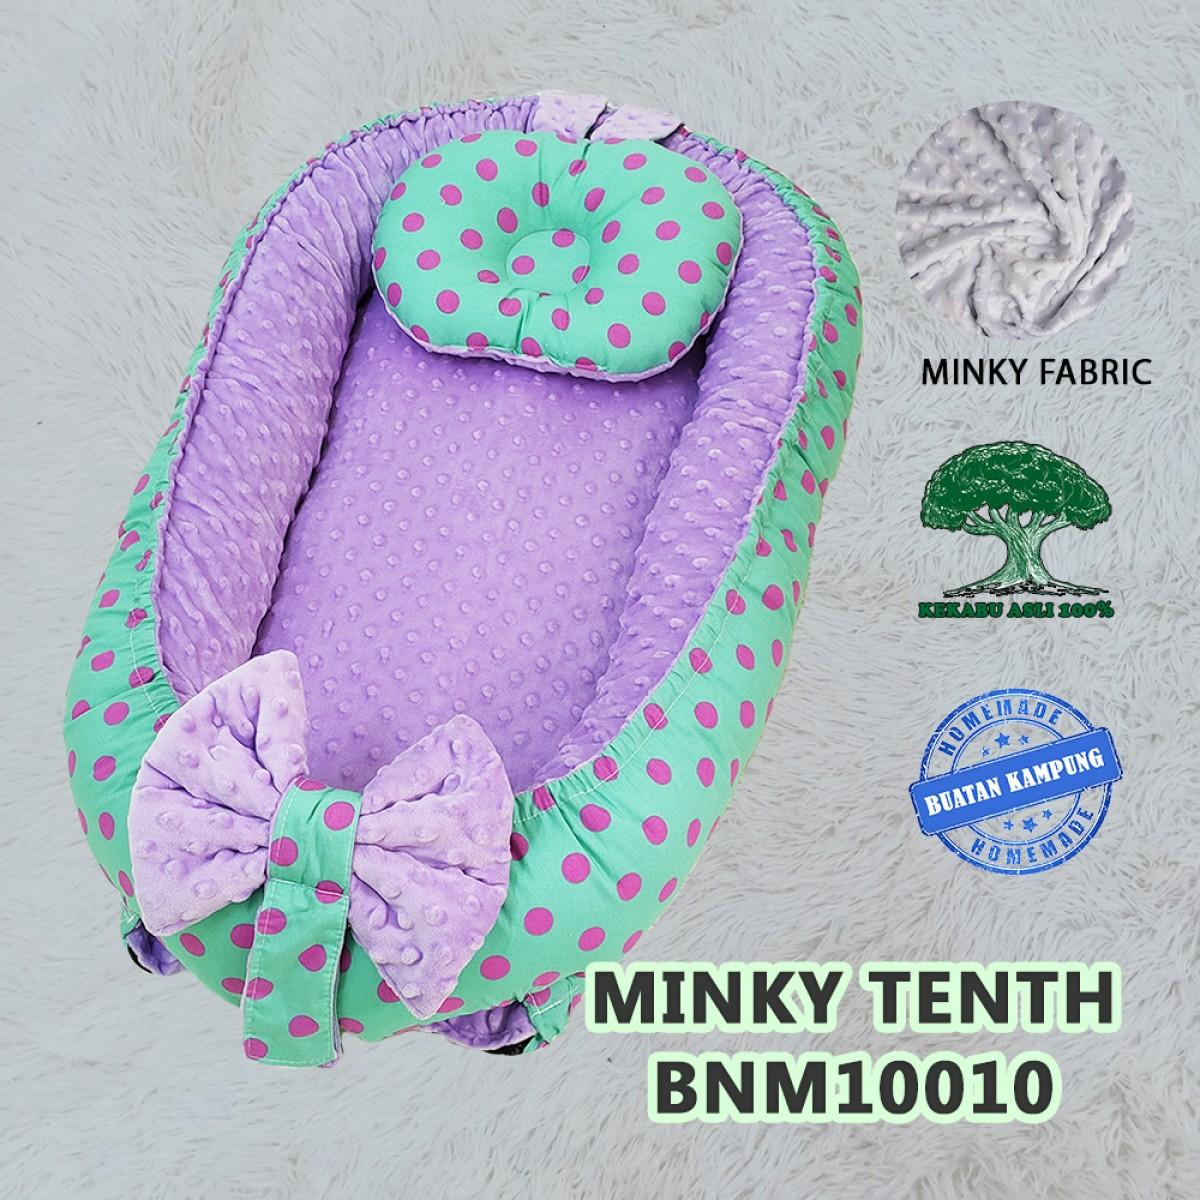 Minky Tenth - Kico Baby Center